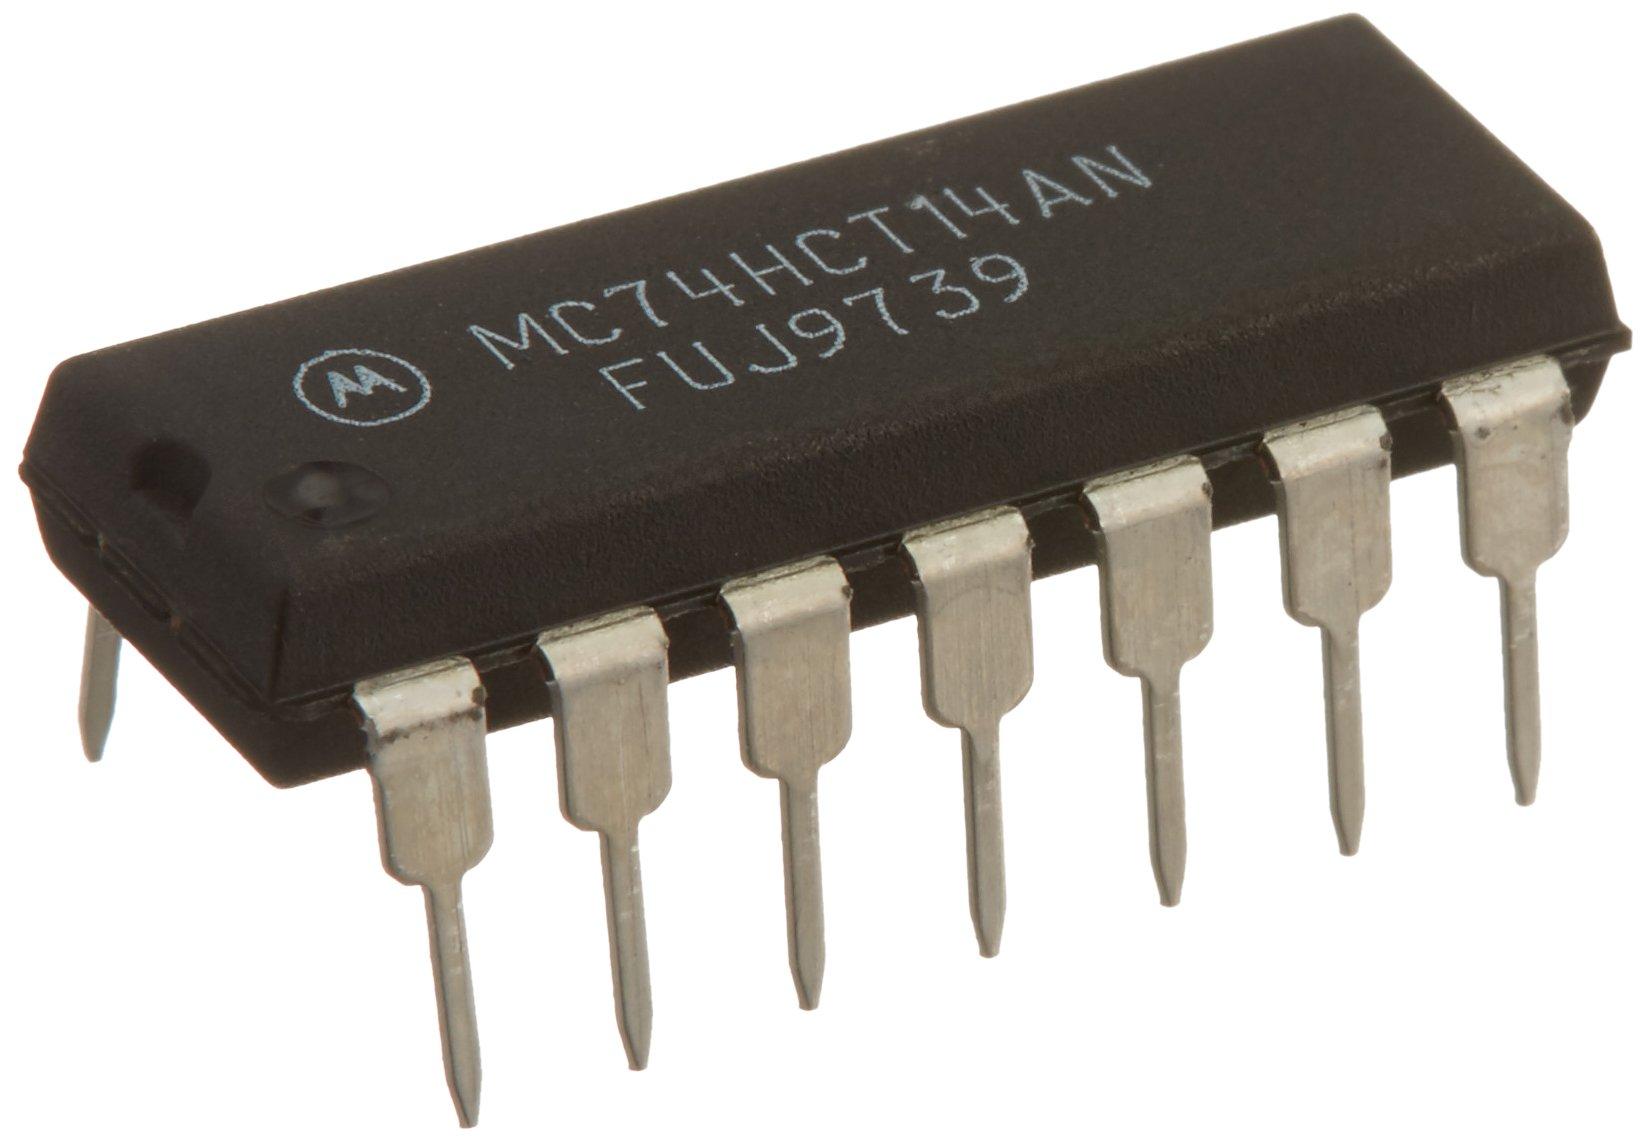 Major Brands 74HCT14 ICS and Semiconductors, Hex Schmitt Trigger Inverter (Pack of 15)